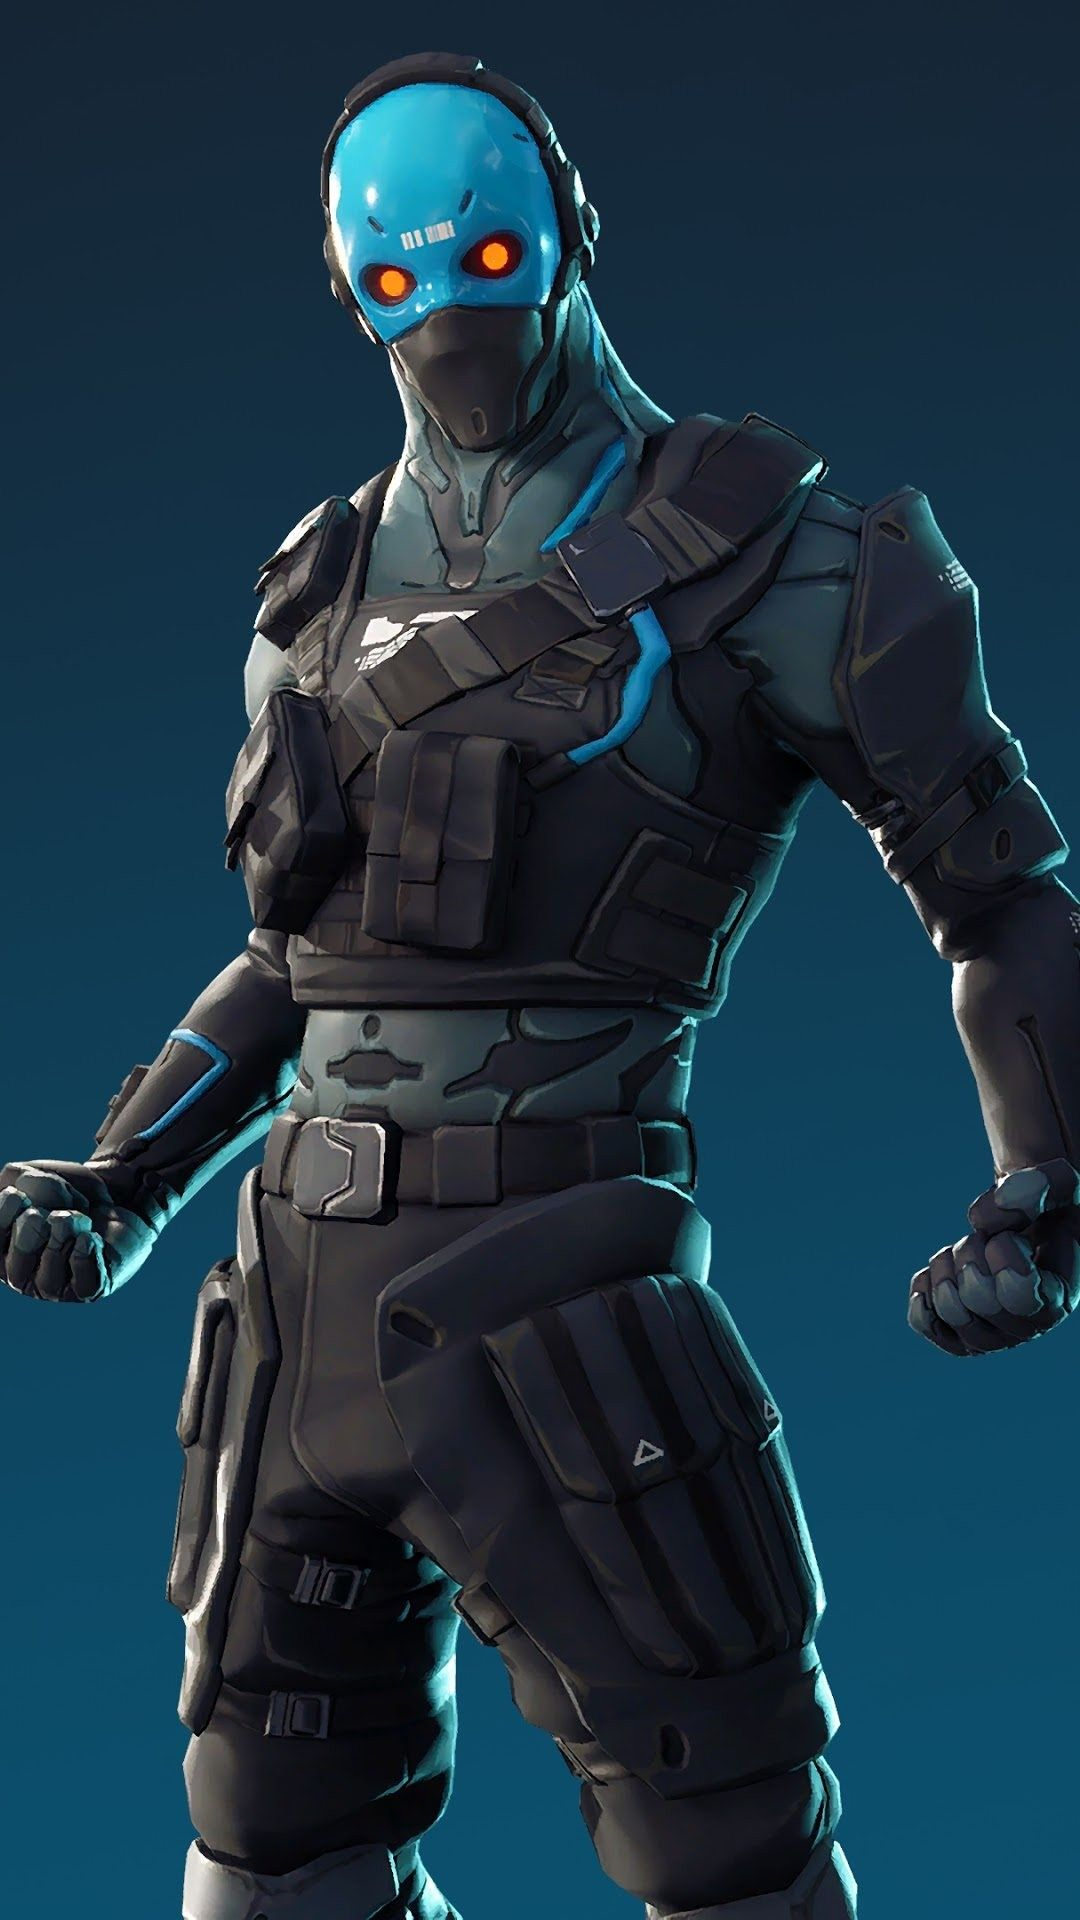 Cobalt Game Store Fortnite Epic Games